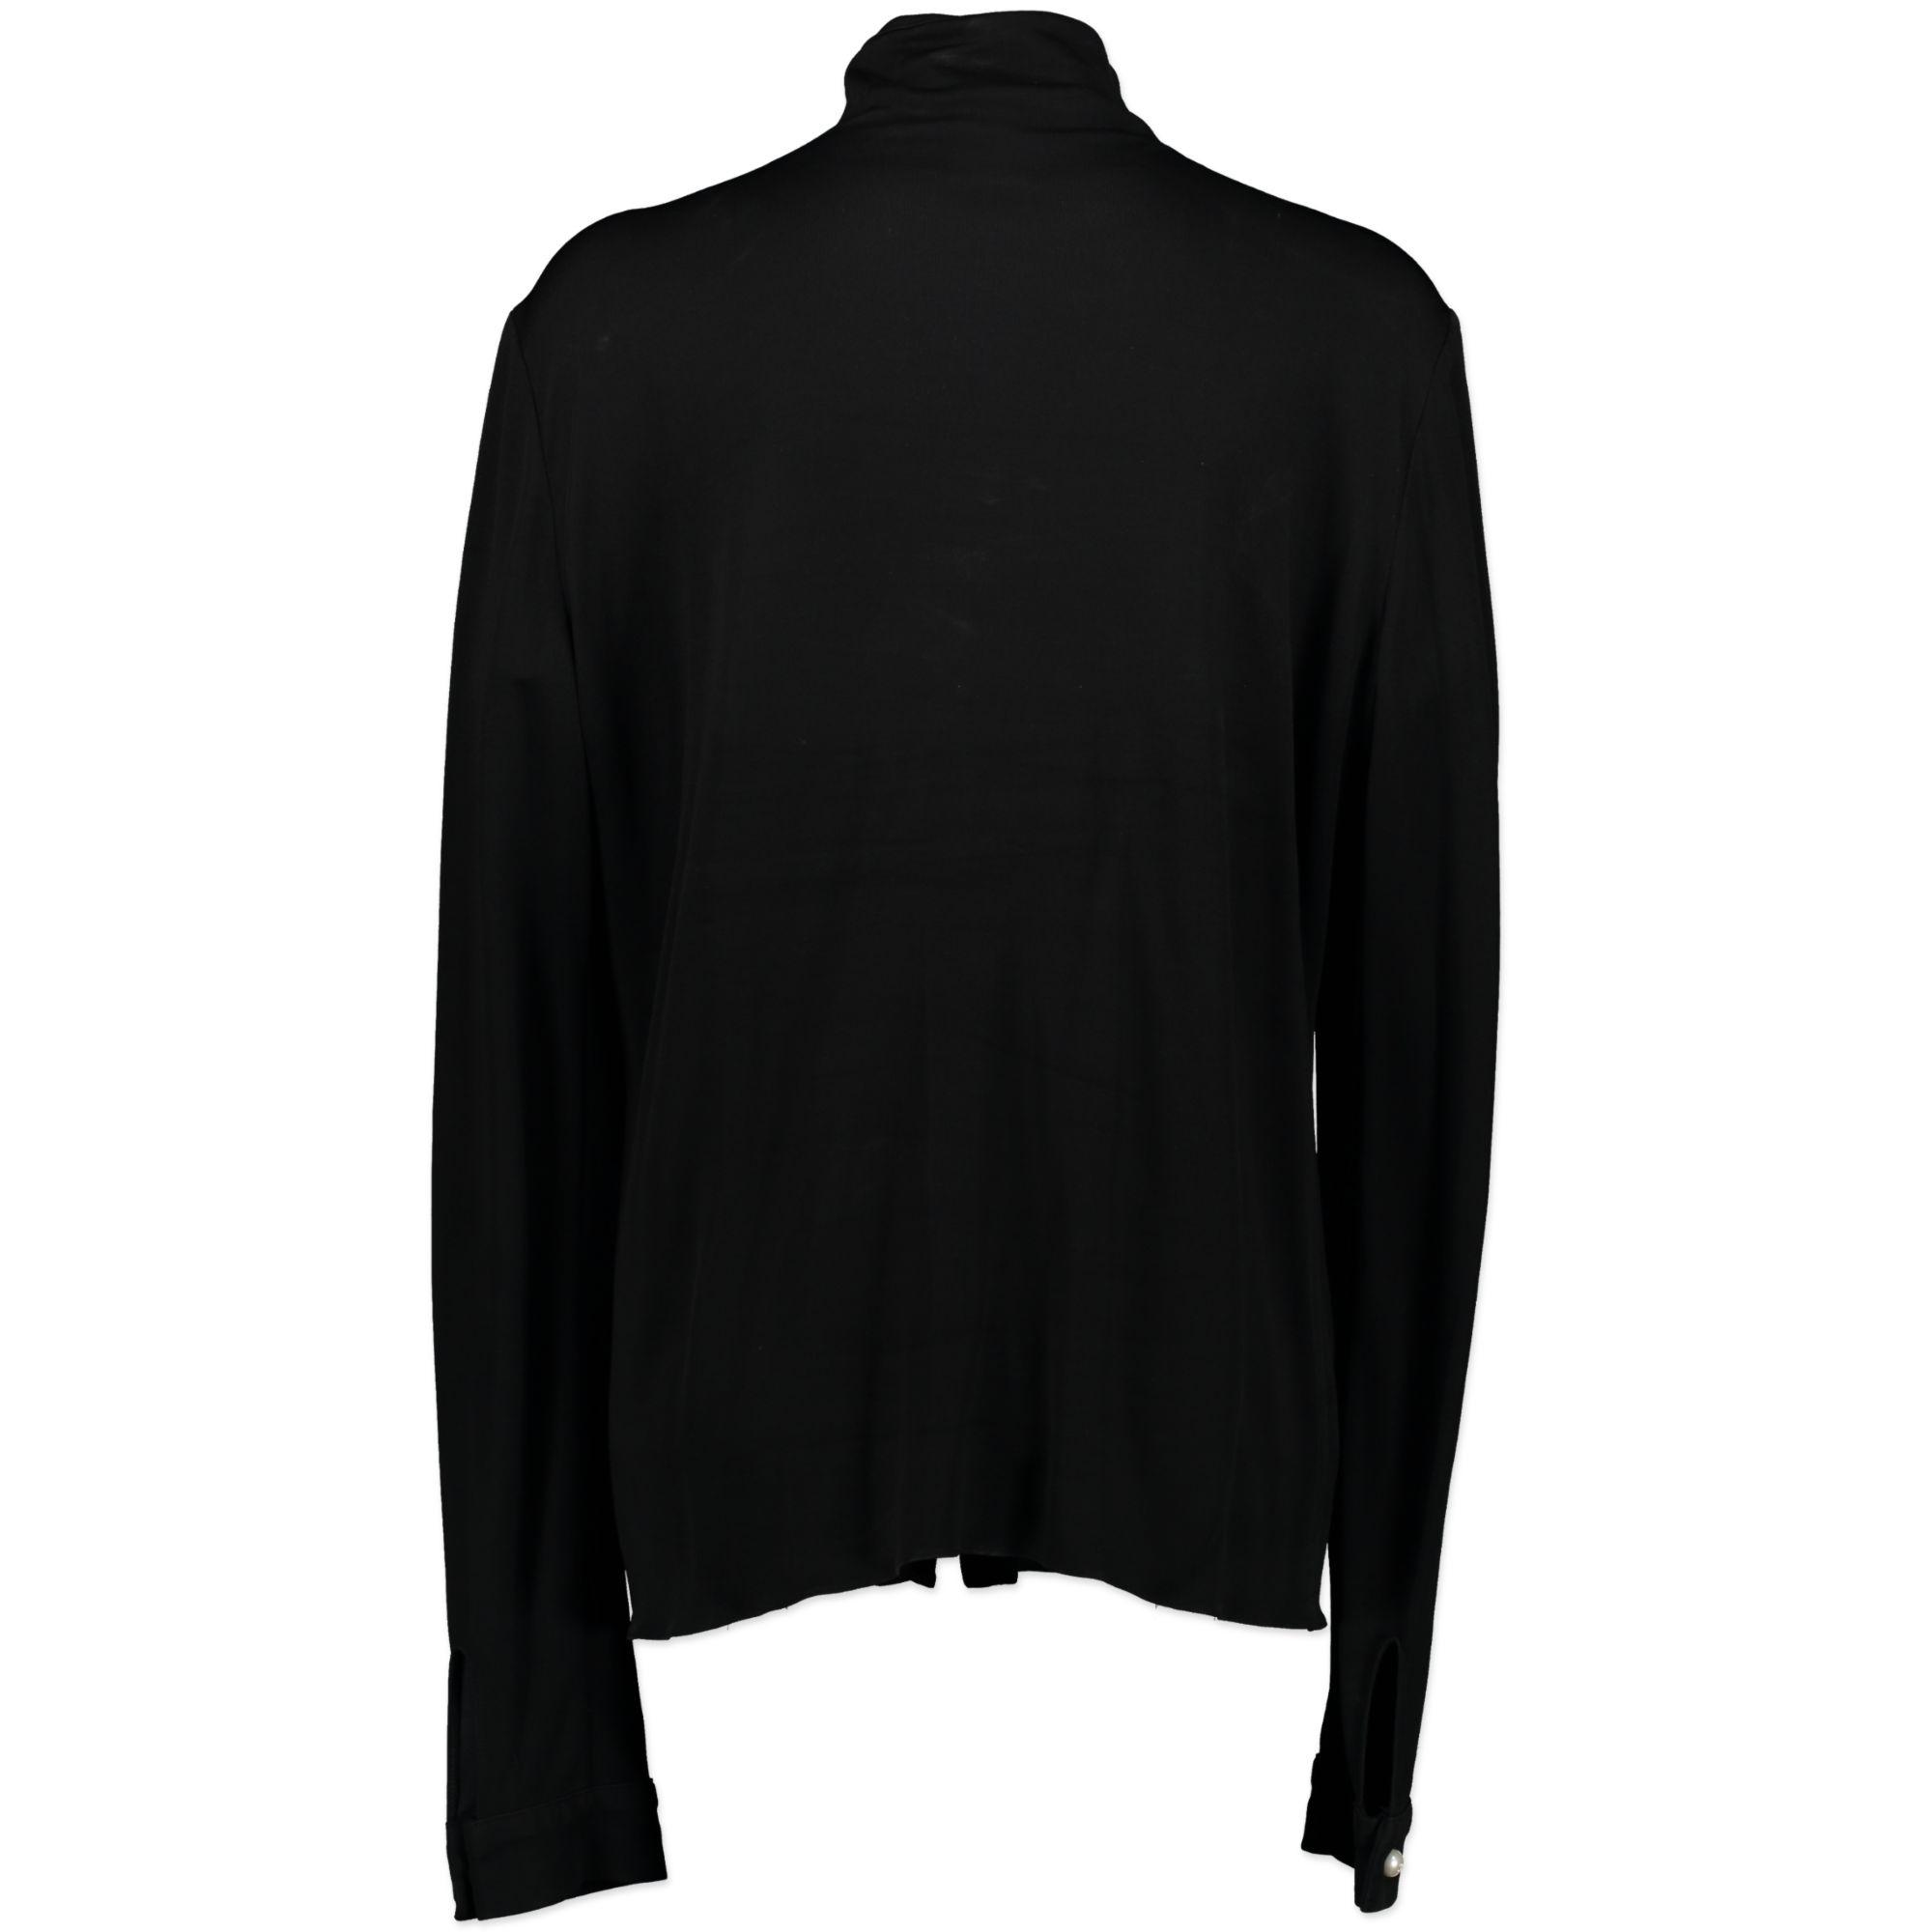 Chanel Black Long Sleeve Blouse Pearl Embellished Button Detail - Size FR50 autentic designer clothes vintage online